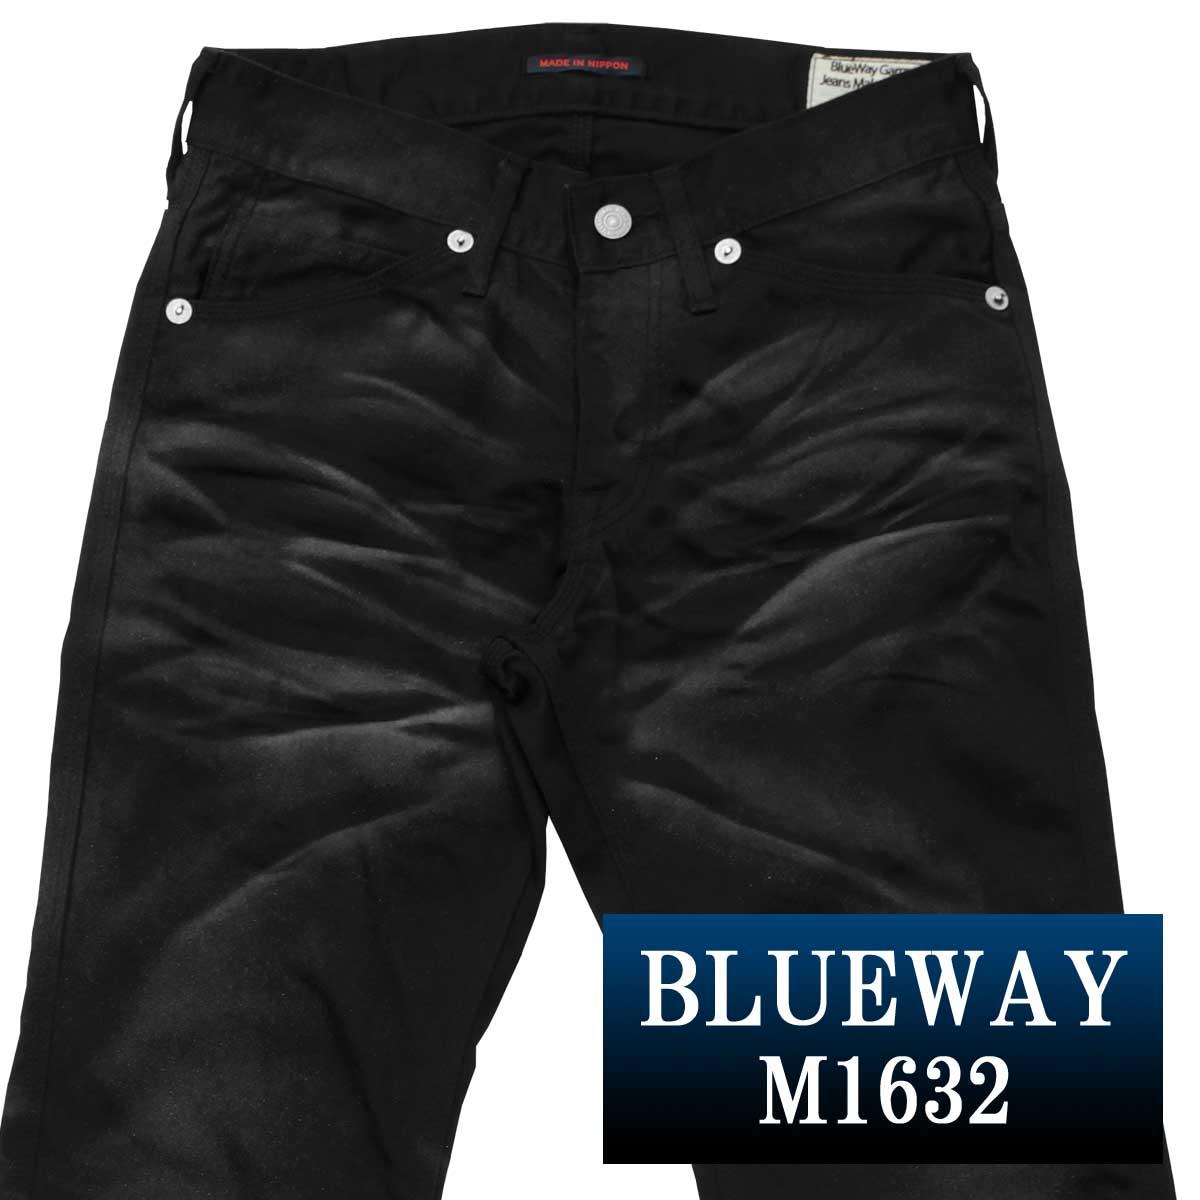 BLUEWAY:ビンテージサテン・エンジニアインカットパンツ(スイーパーダイ:ブラック):M1632-5365 ブルーウェイ パンツ メンズ サテン 裾上げ